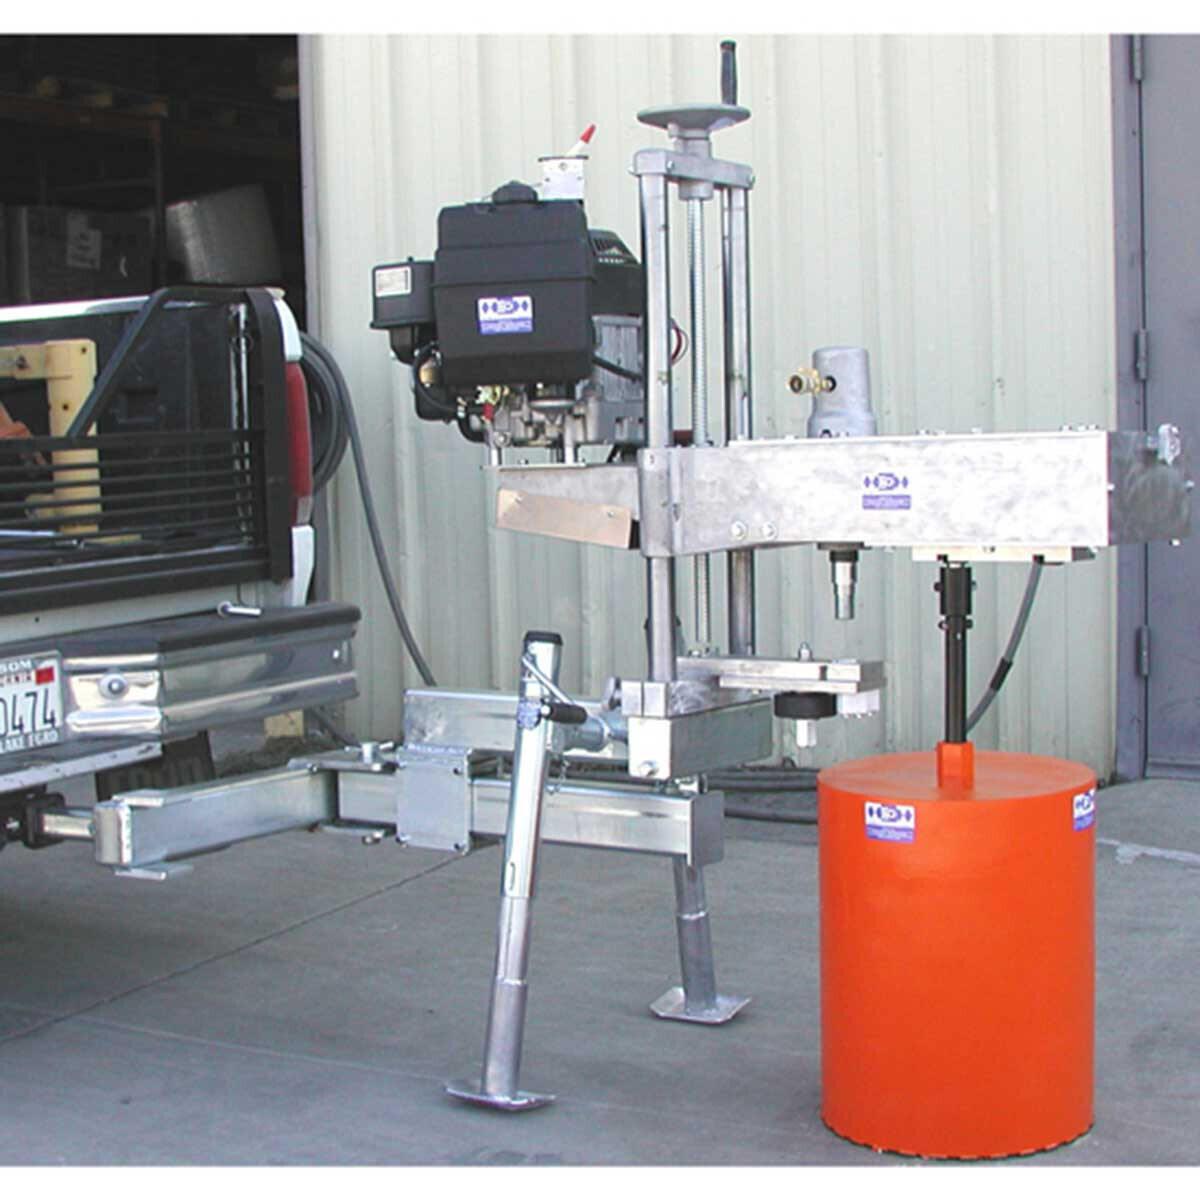 Kor-It K-1700 Flexible Position Receiver Core Drilling System